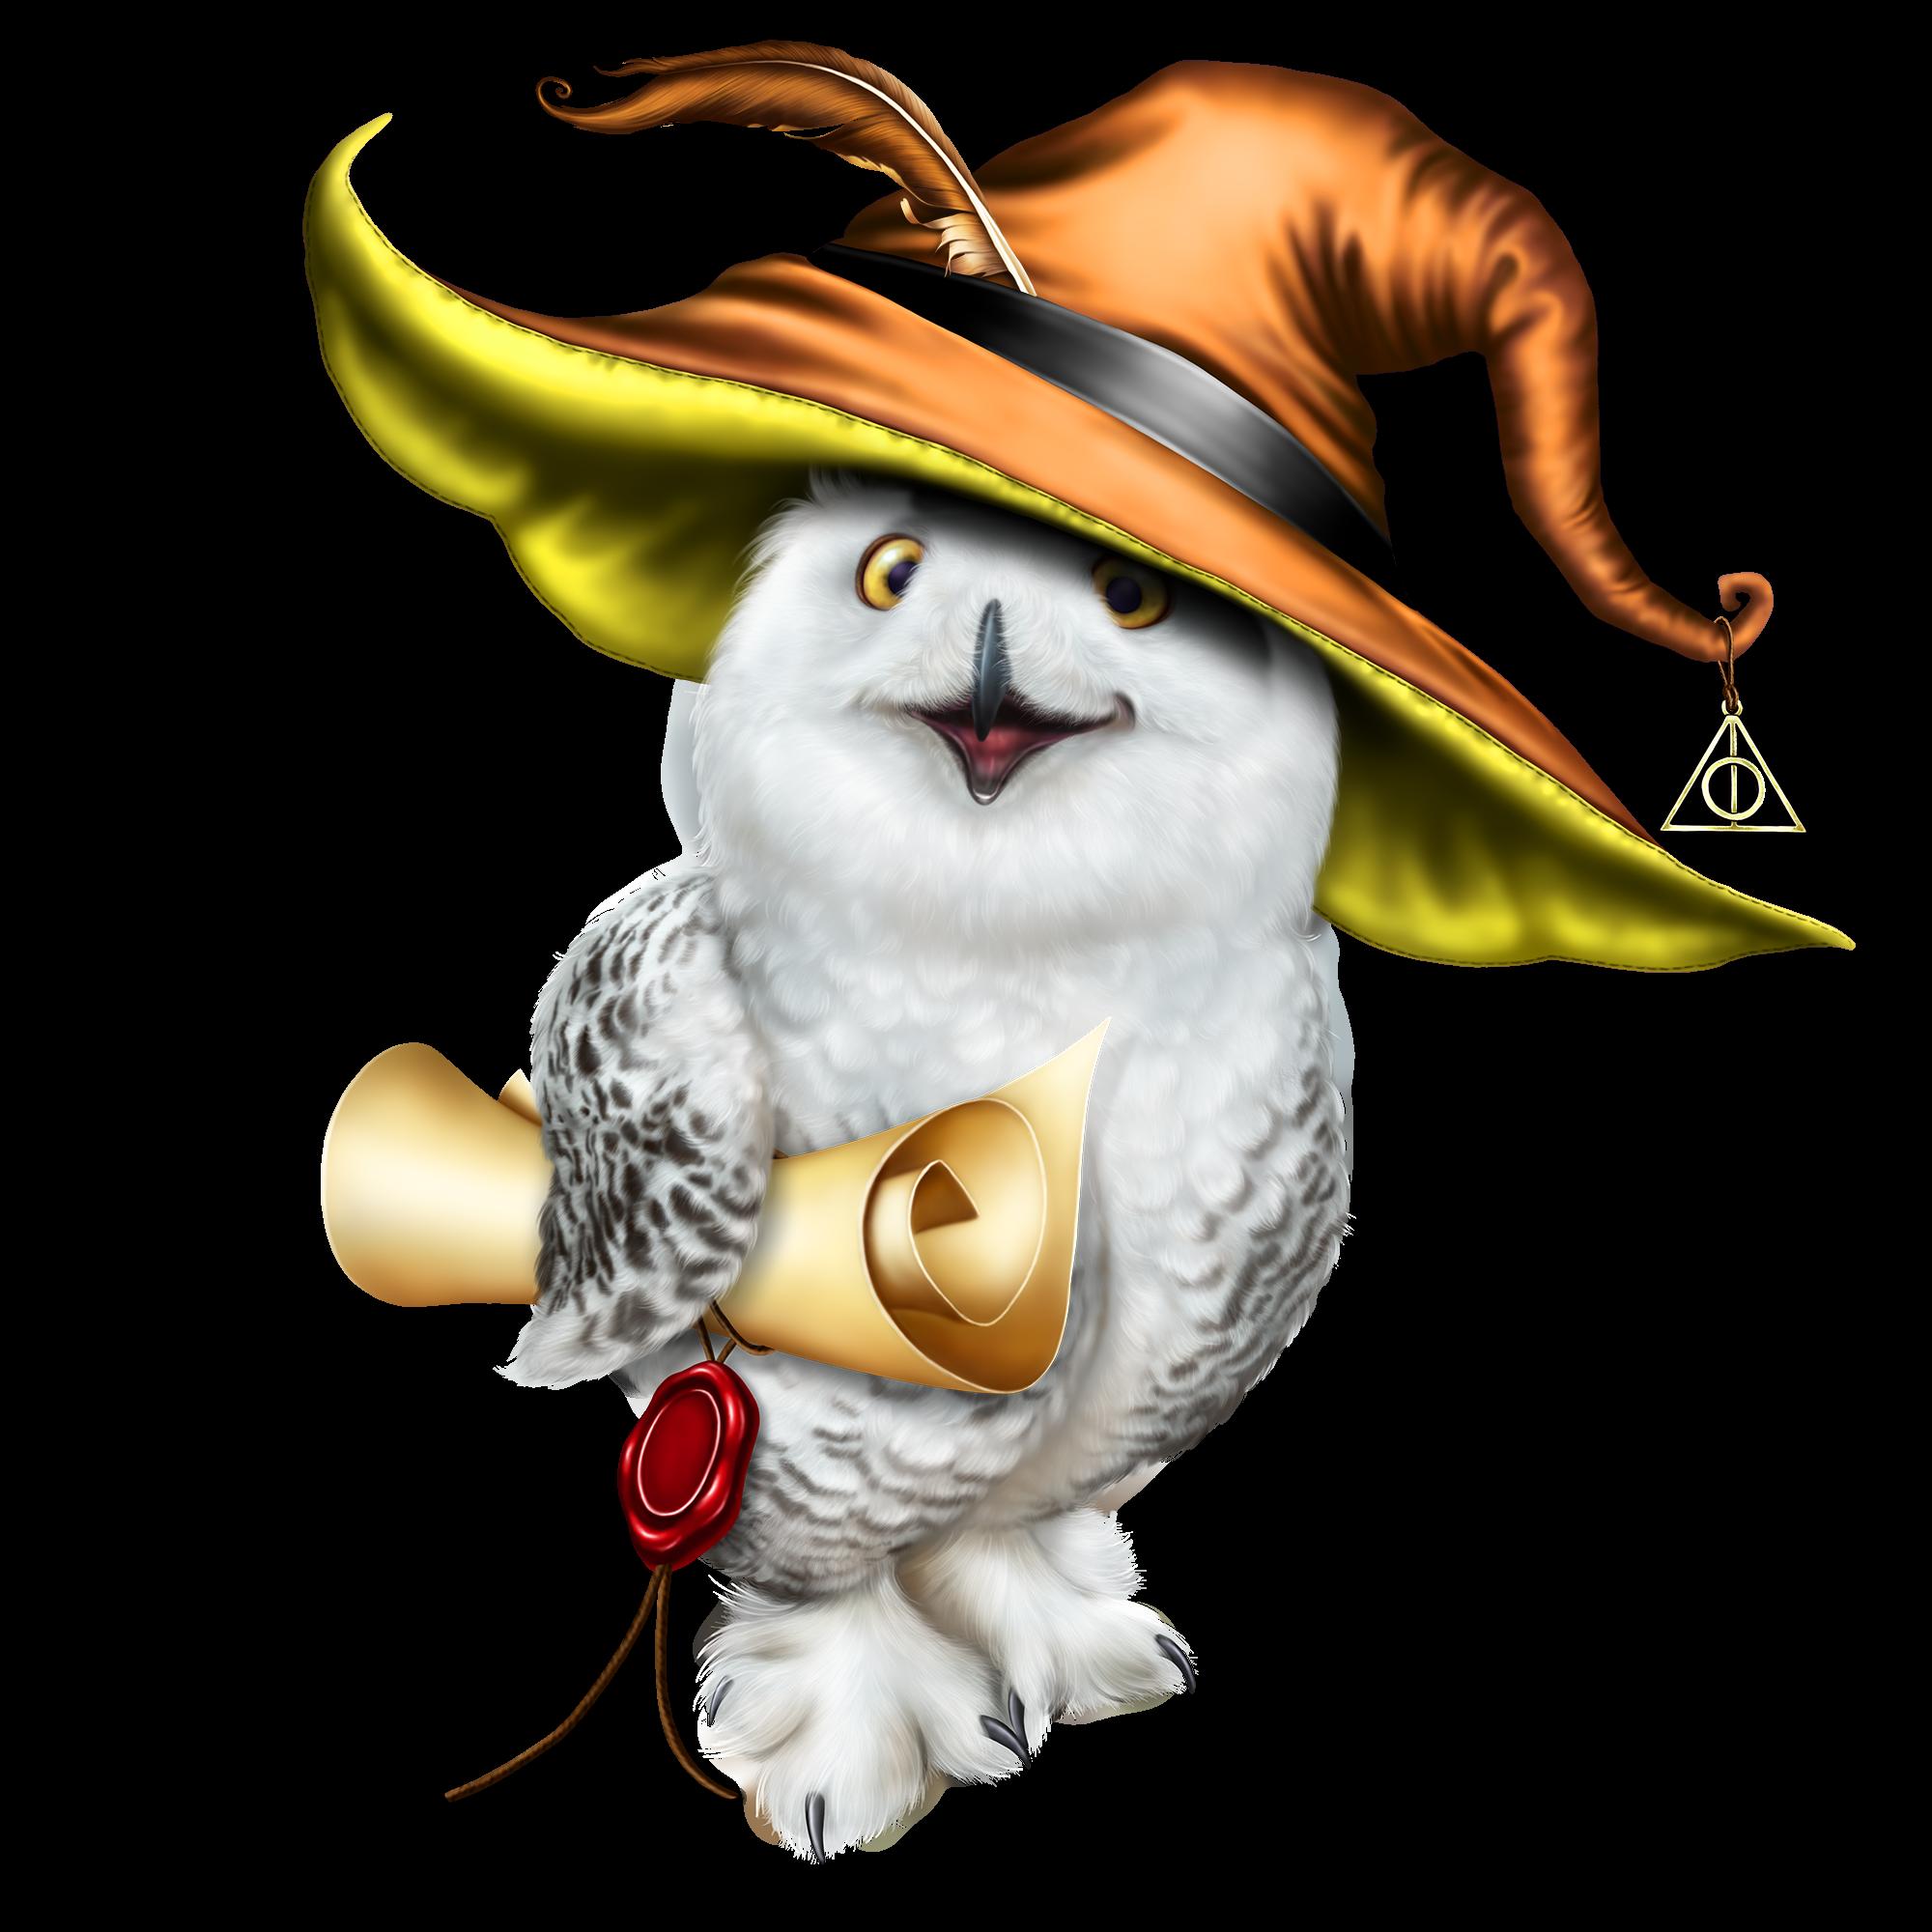 Cartoon Harry Potter Owl Png